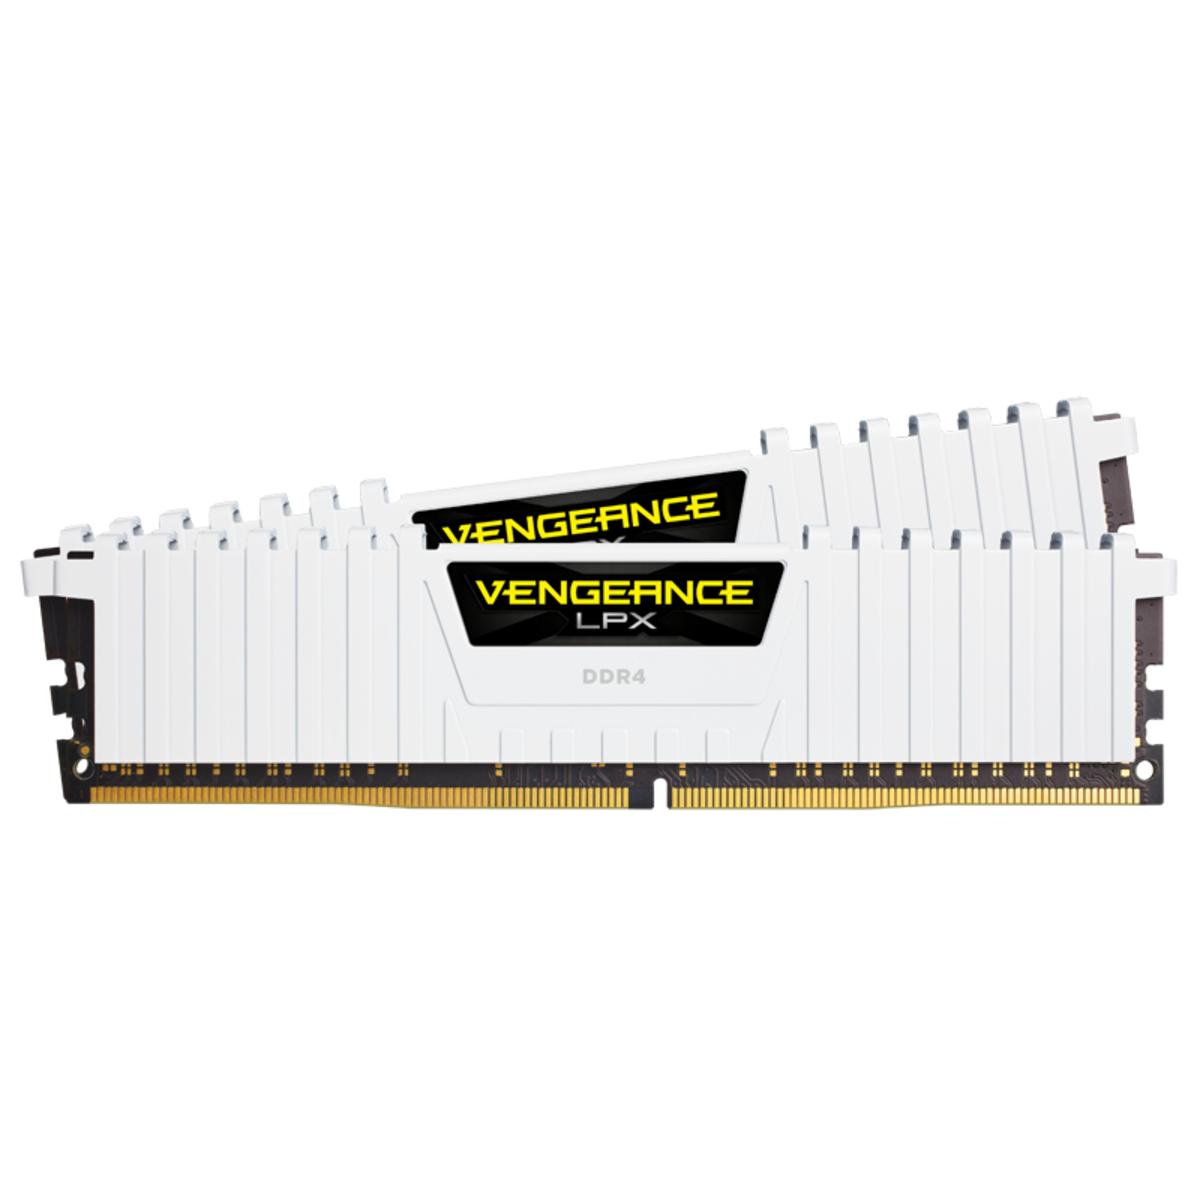 Corsair Vengeance LPX CMK16GX4M2D3000C16W memory module 16 GB DDR4 3000 MHz